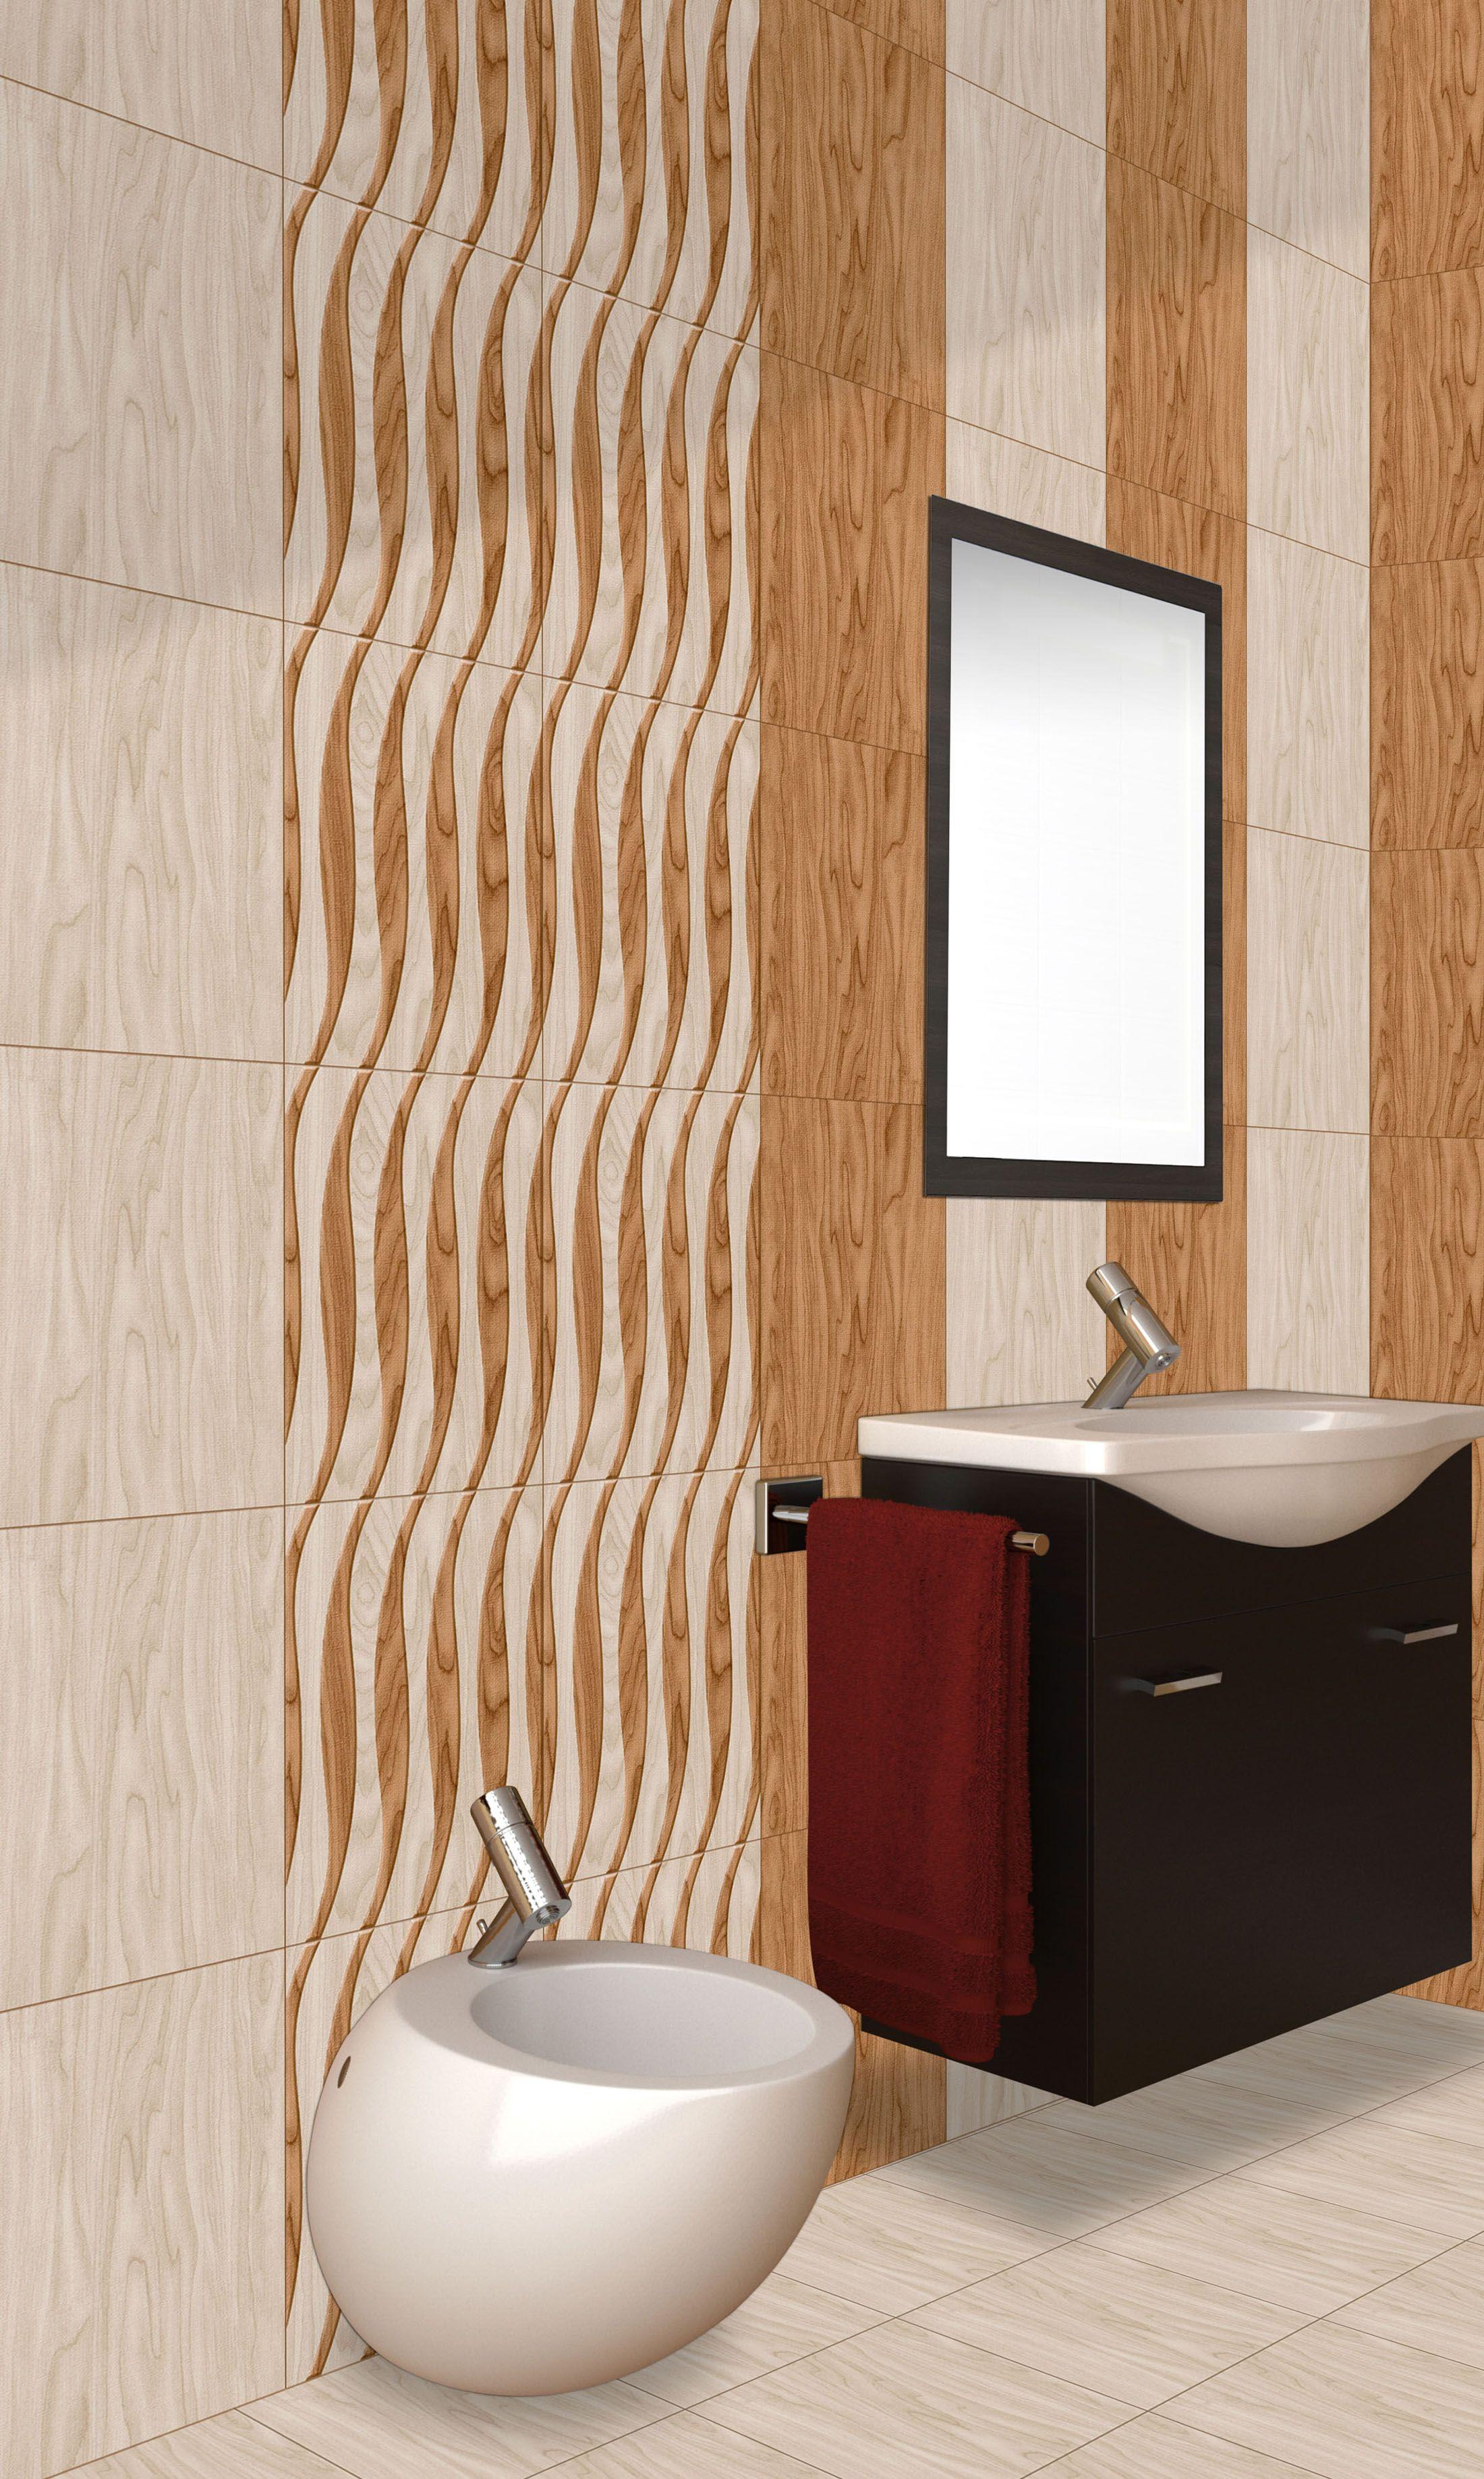 Bathroom Tiles Bathroom Wall Tiles Floor Tiles In India Tile Bathroom Bathroom Wall Tile Wall And Floor Tiles